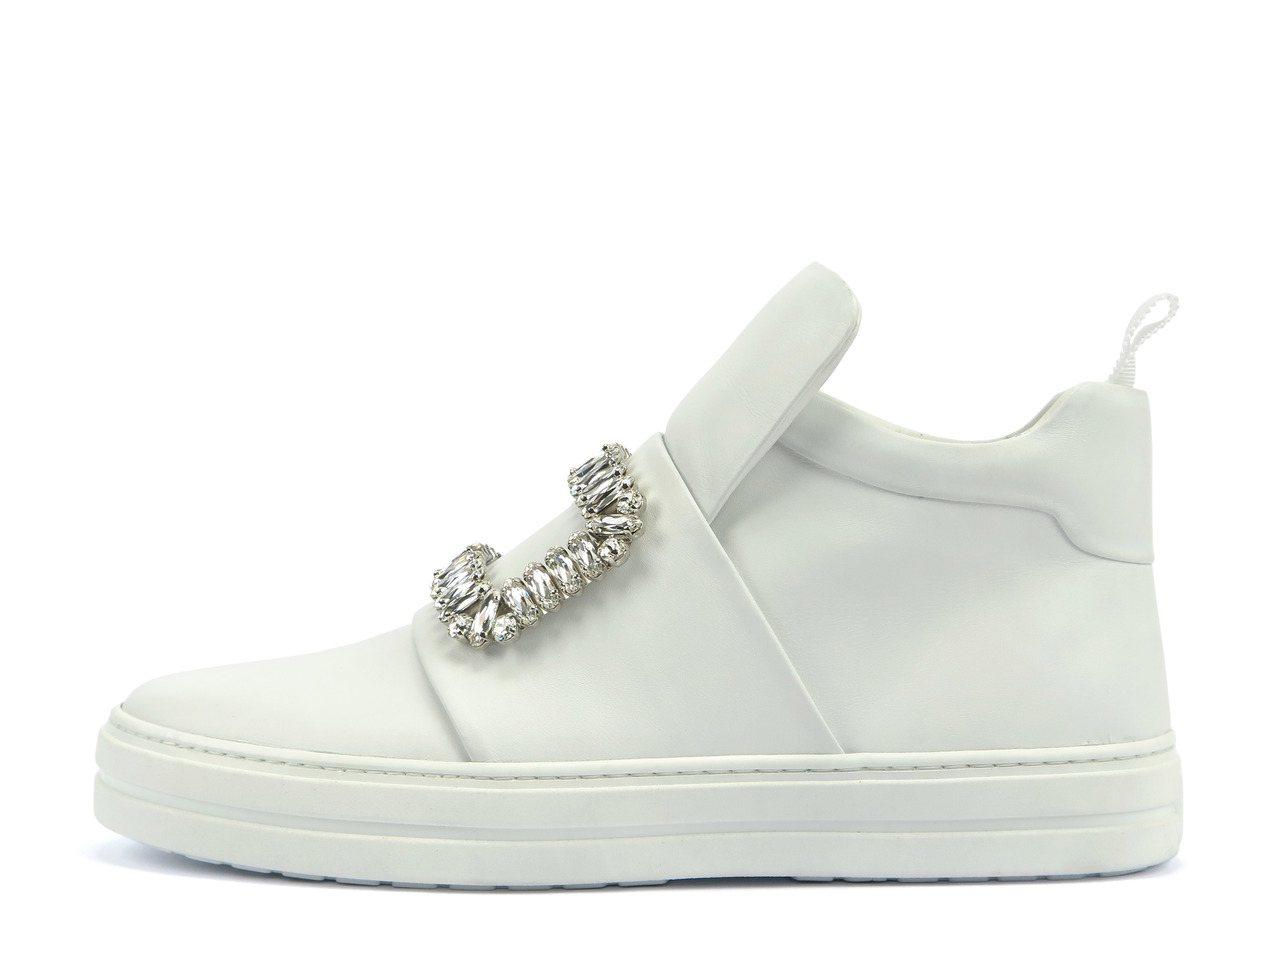 SNEAKY VIV水鑽釦飾中筒球鞋(白),59,900元。圖/Roger Vi...